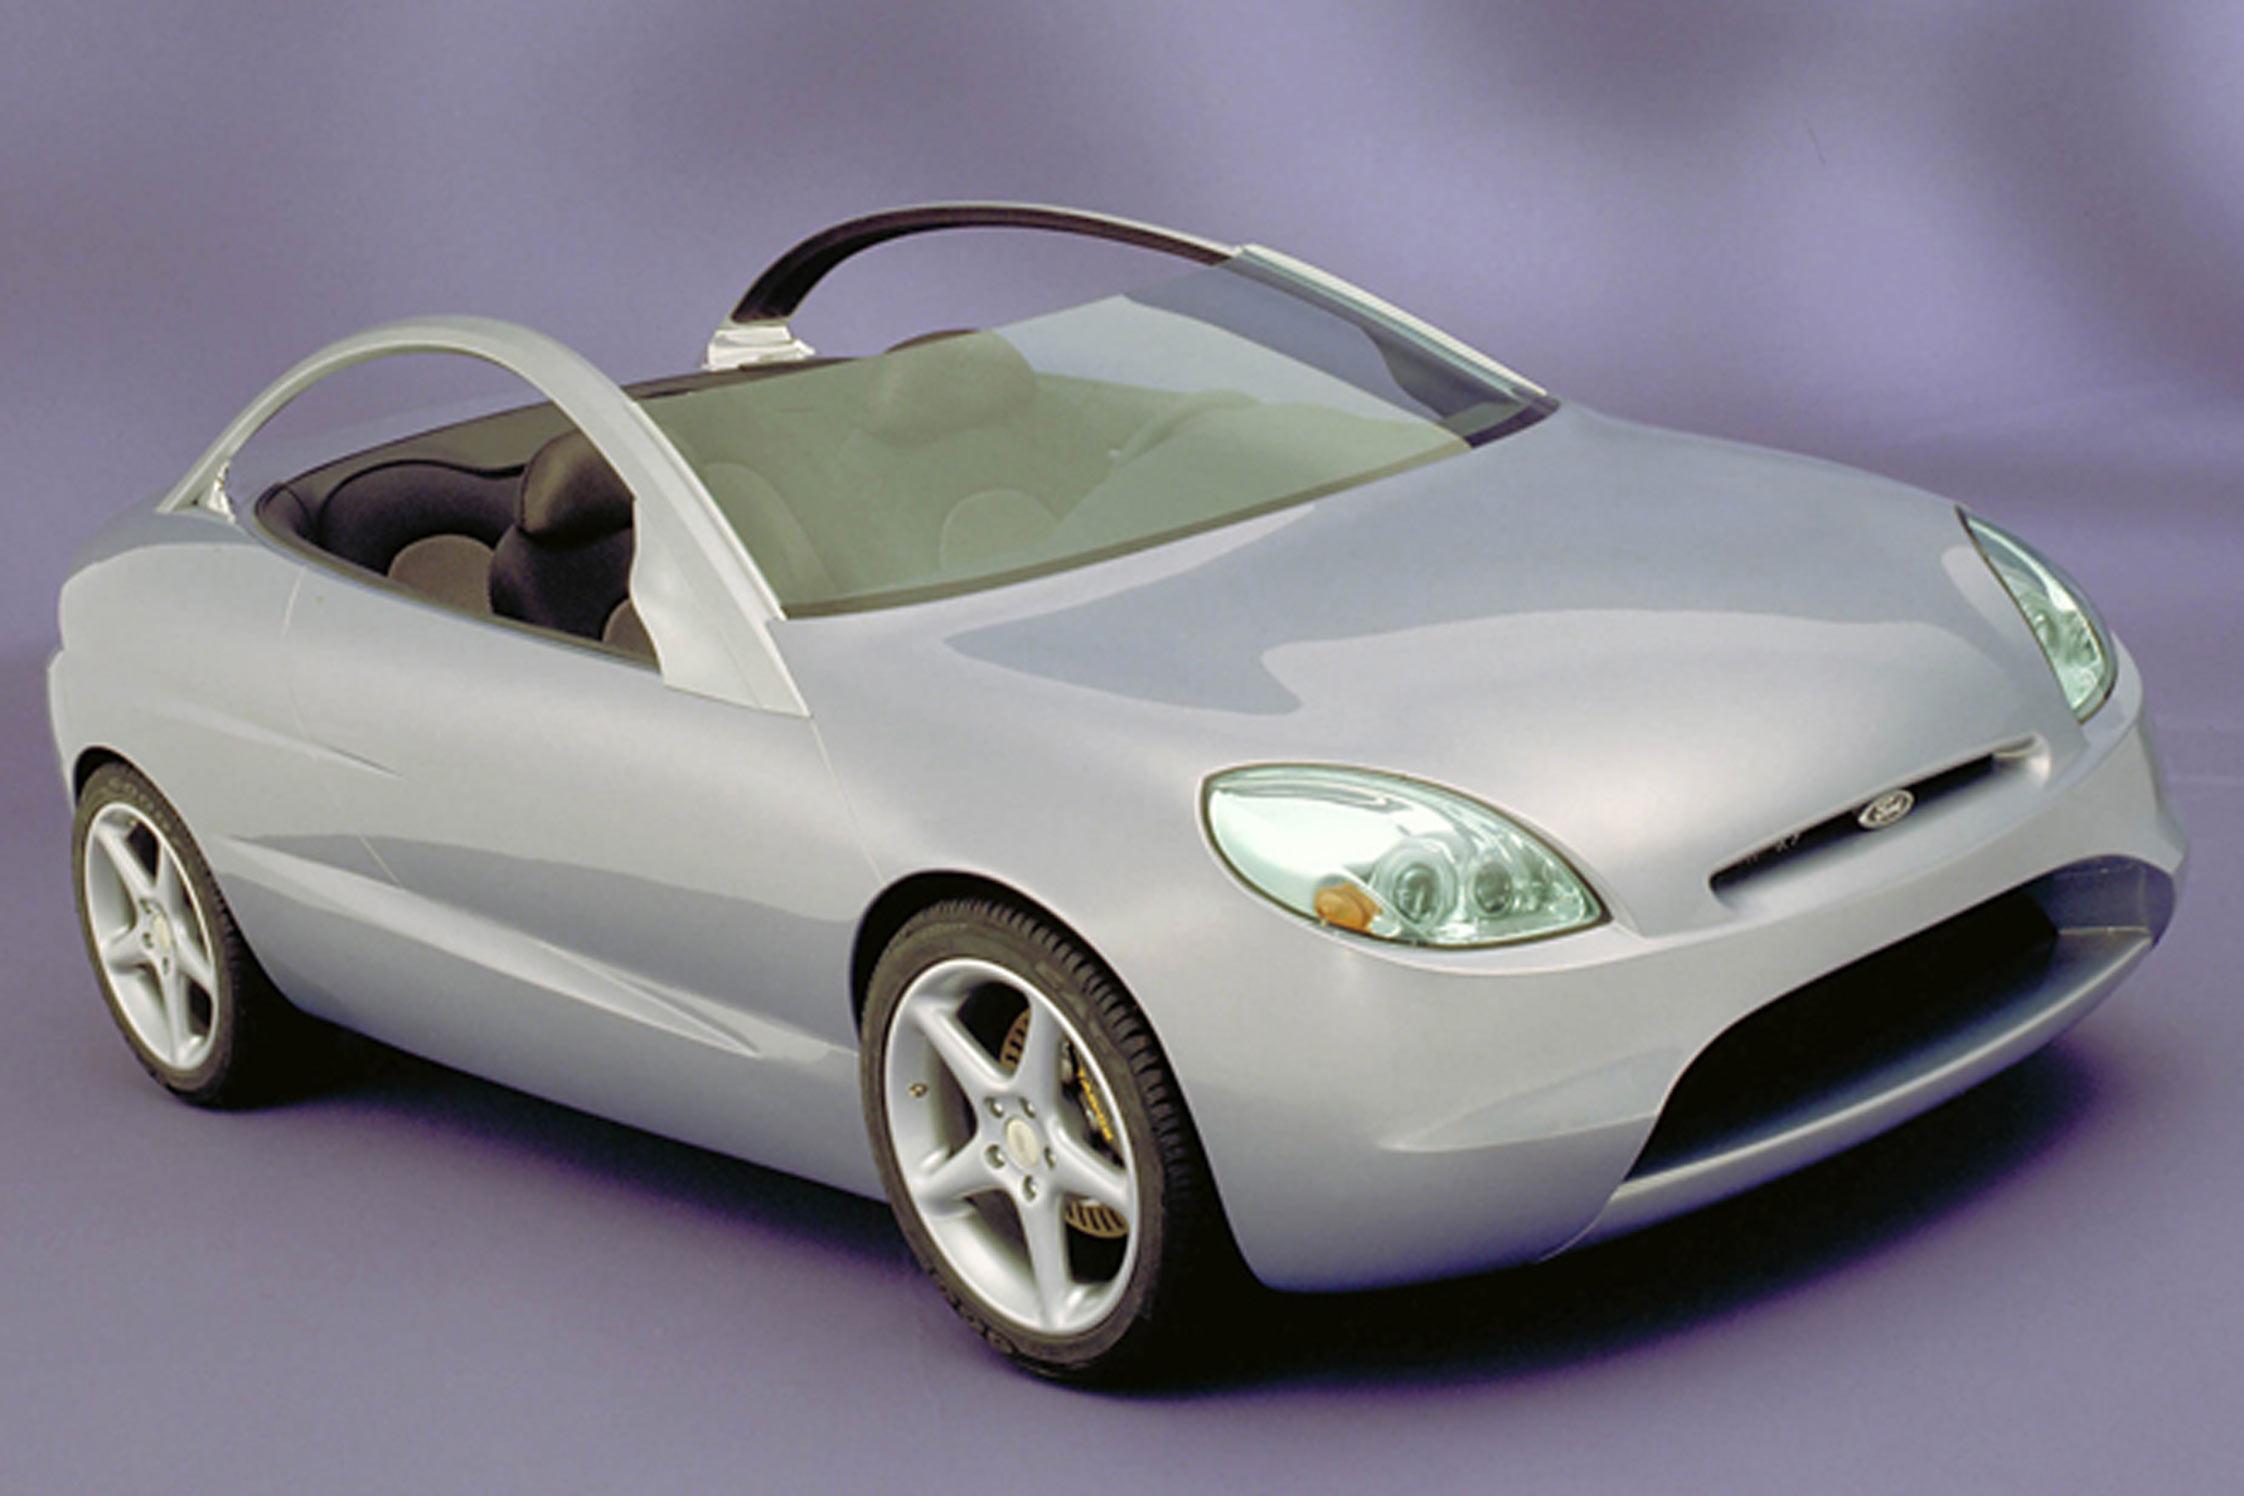 photo ghia lynx concept concept car 1996 m diatheque. Black Bedroom Furniture Sets. Home Design Ideas